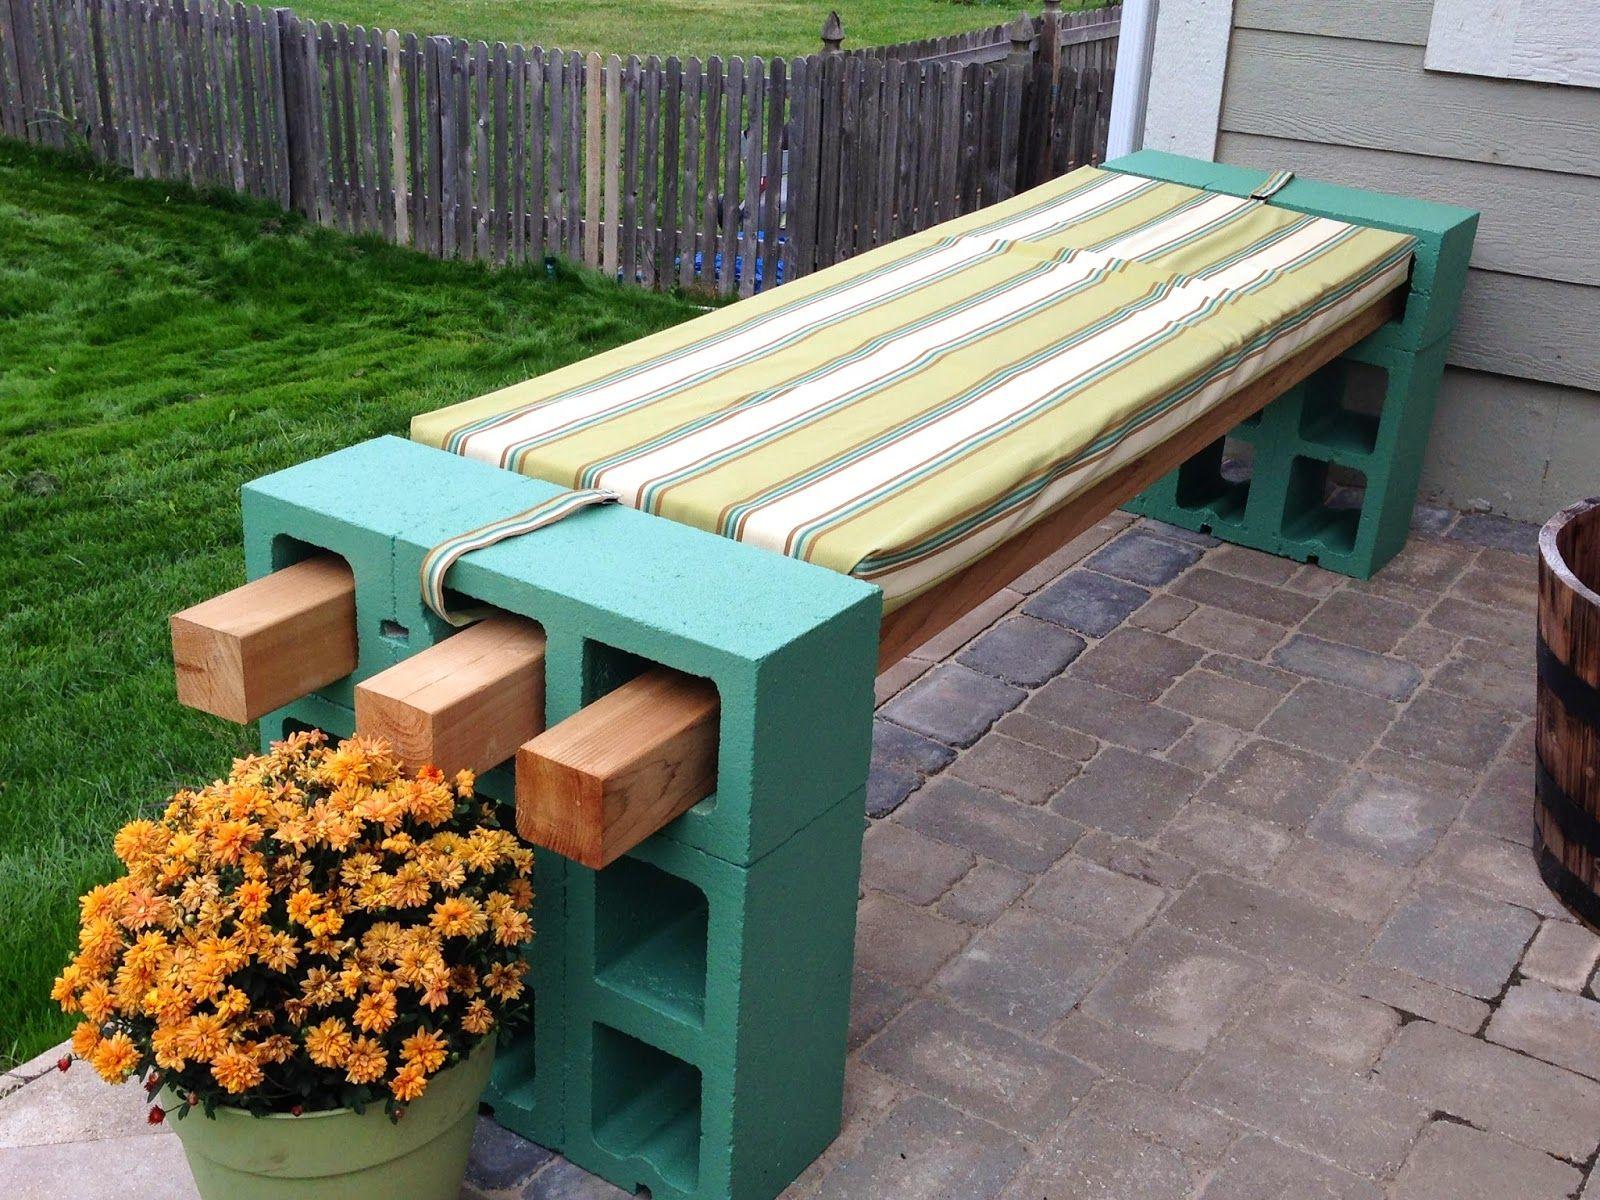 Gartenmöbel selber bauen beton  IMG_1347.JPG (1600×1200) | Odds and ends | Pinterest